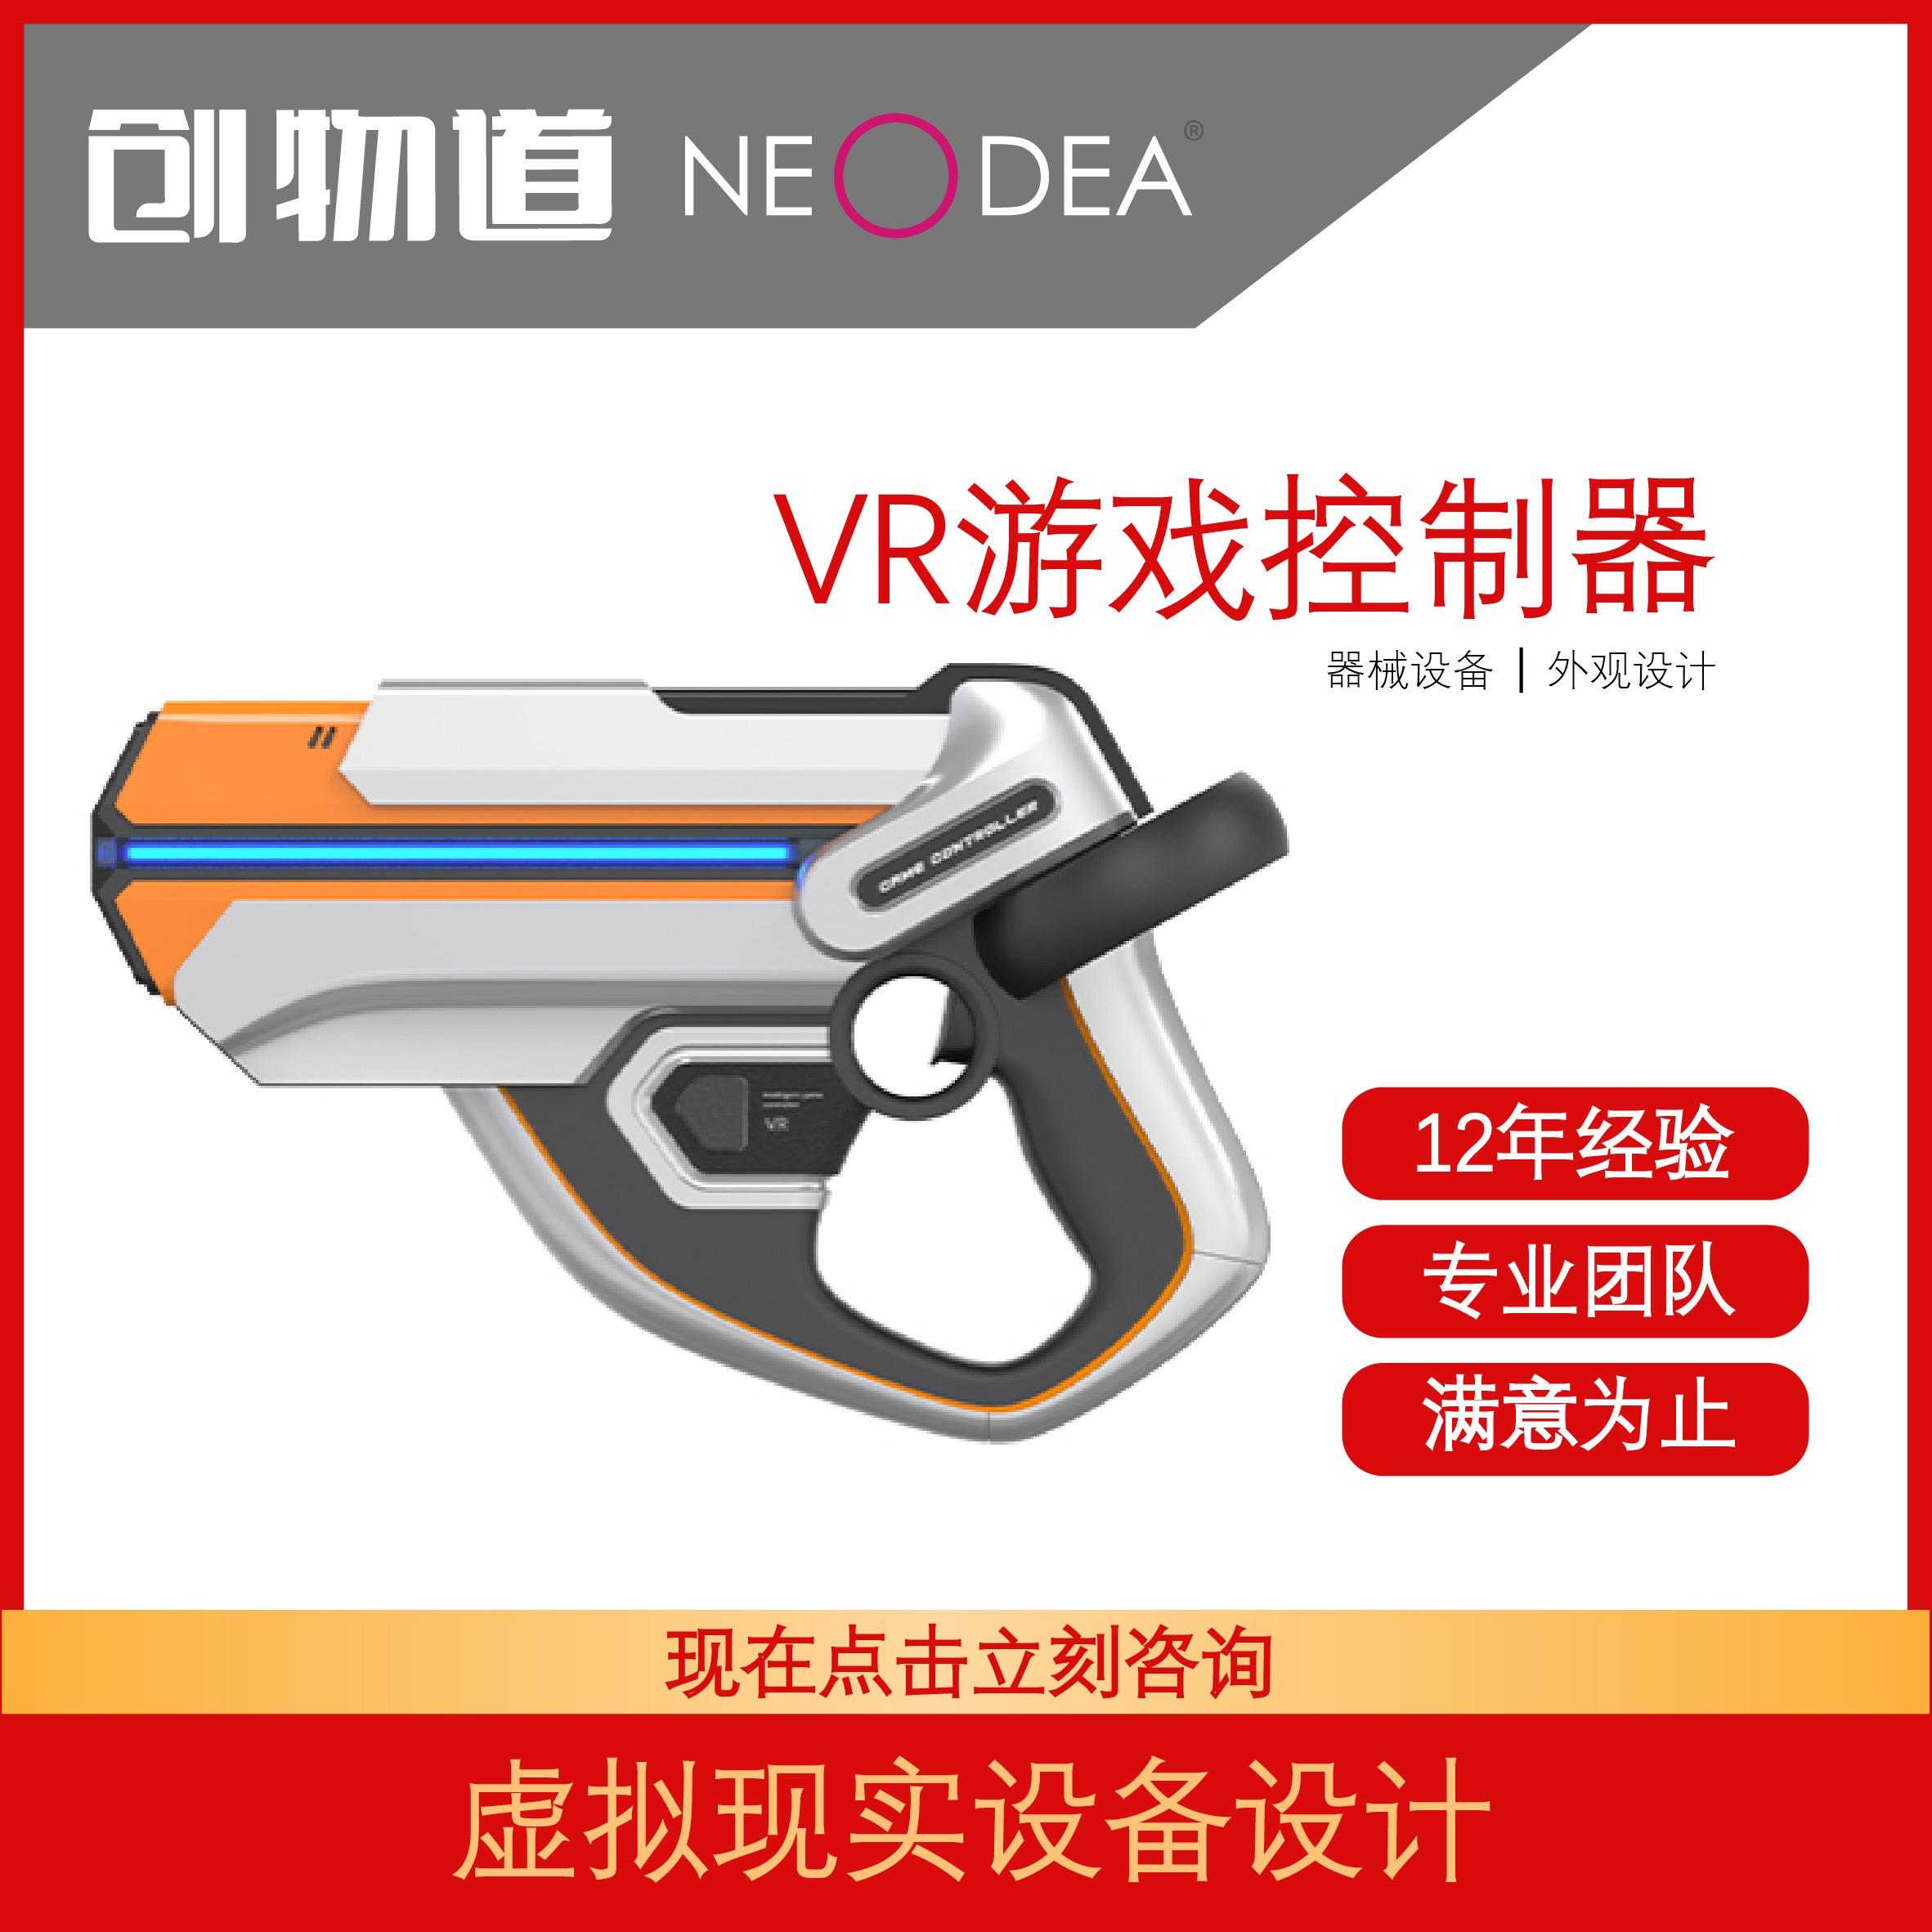 【VR AR虚拟现实】游戏手柄眼镜概念设计自动化设计vr全景